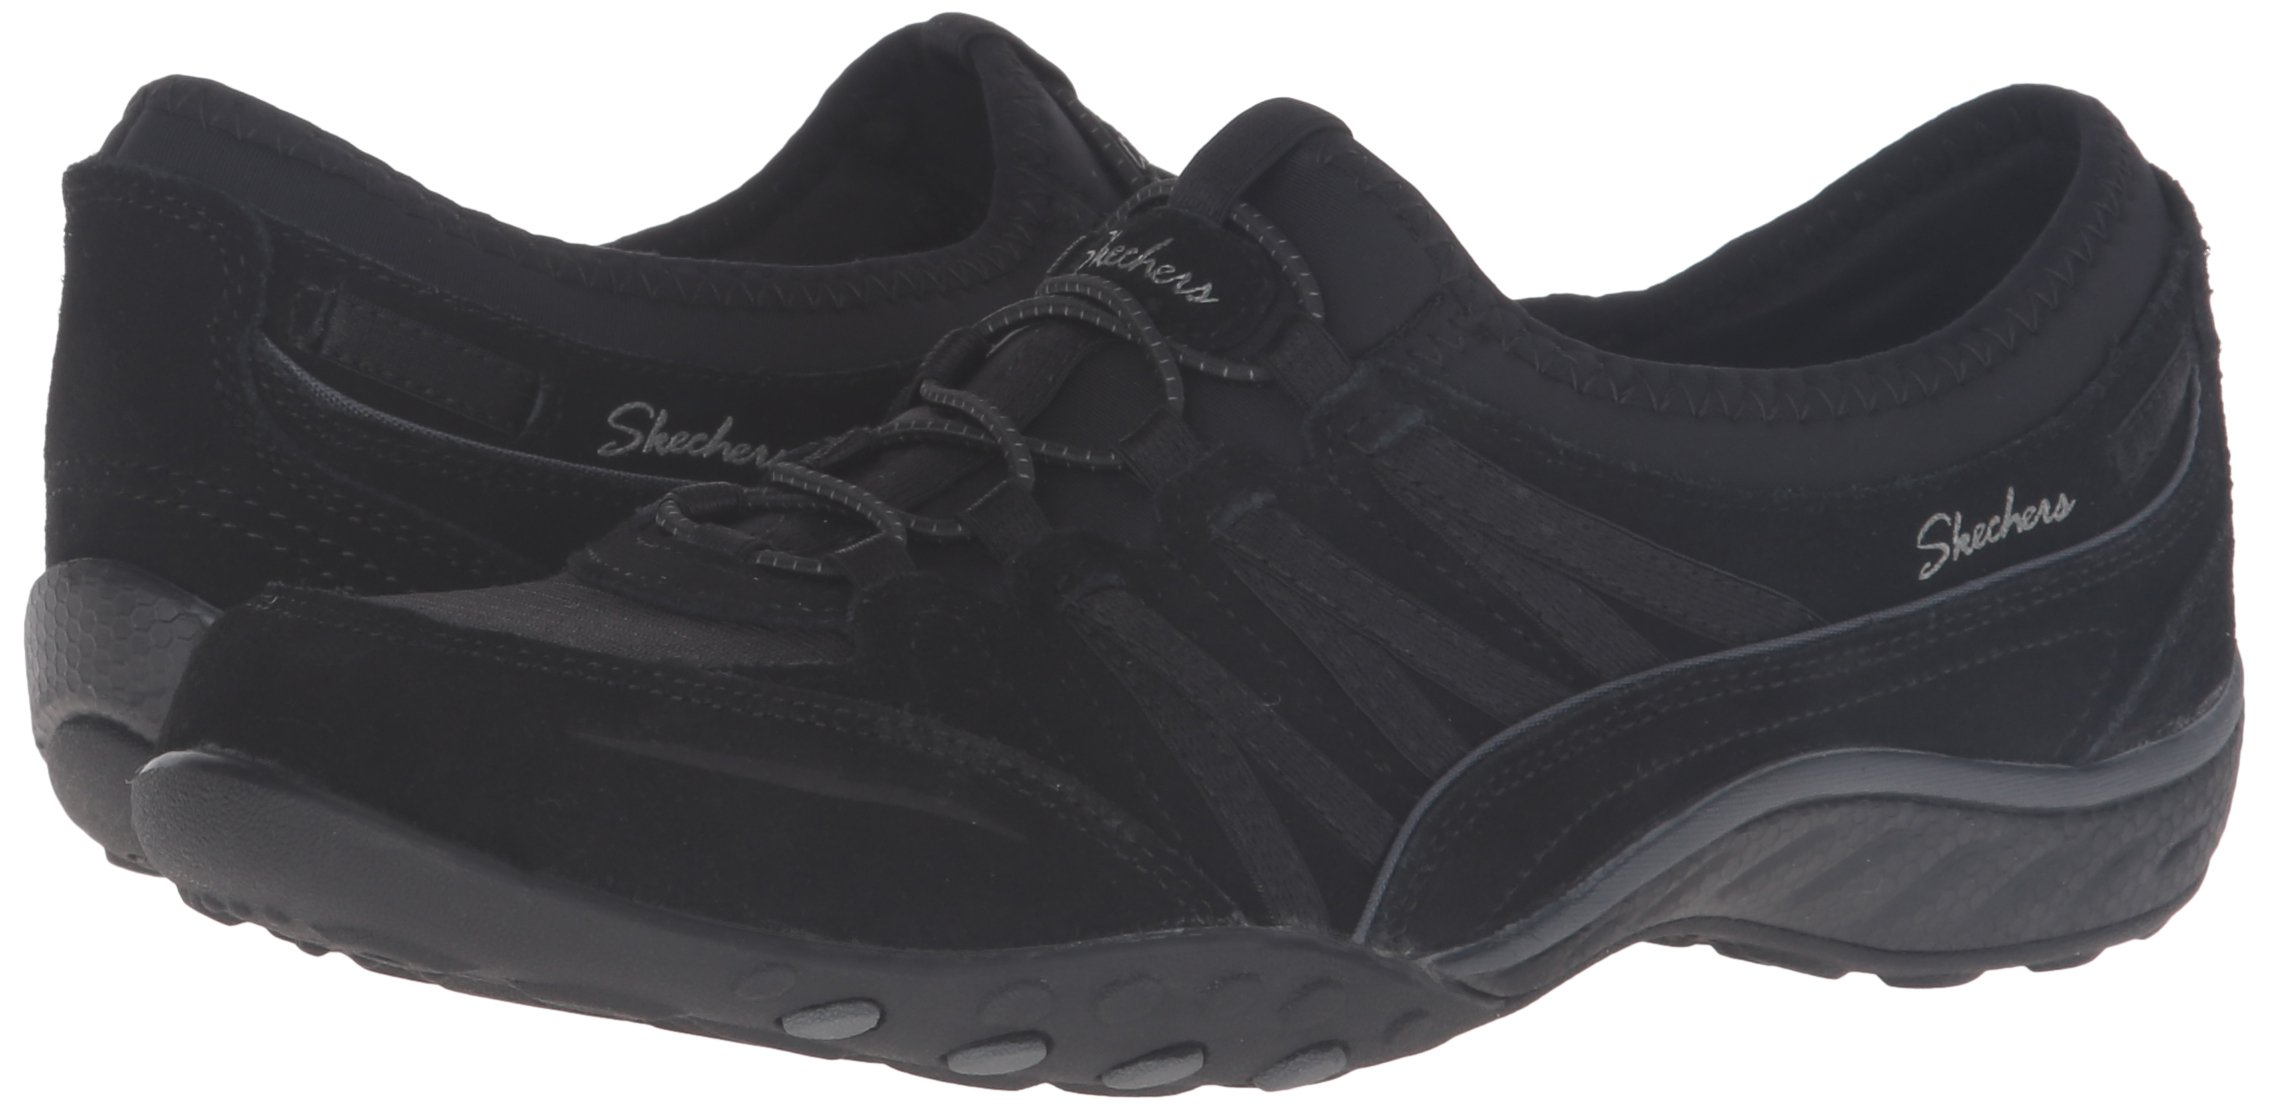 c0e0812f5f6 Skechers Sport Women's Breathe Easy Moneybags Fashion Sneaker,Black  Suede,9.5 M US - 23020-017 < Walking < Clothing, Shoes & Jewelry - tibs